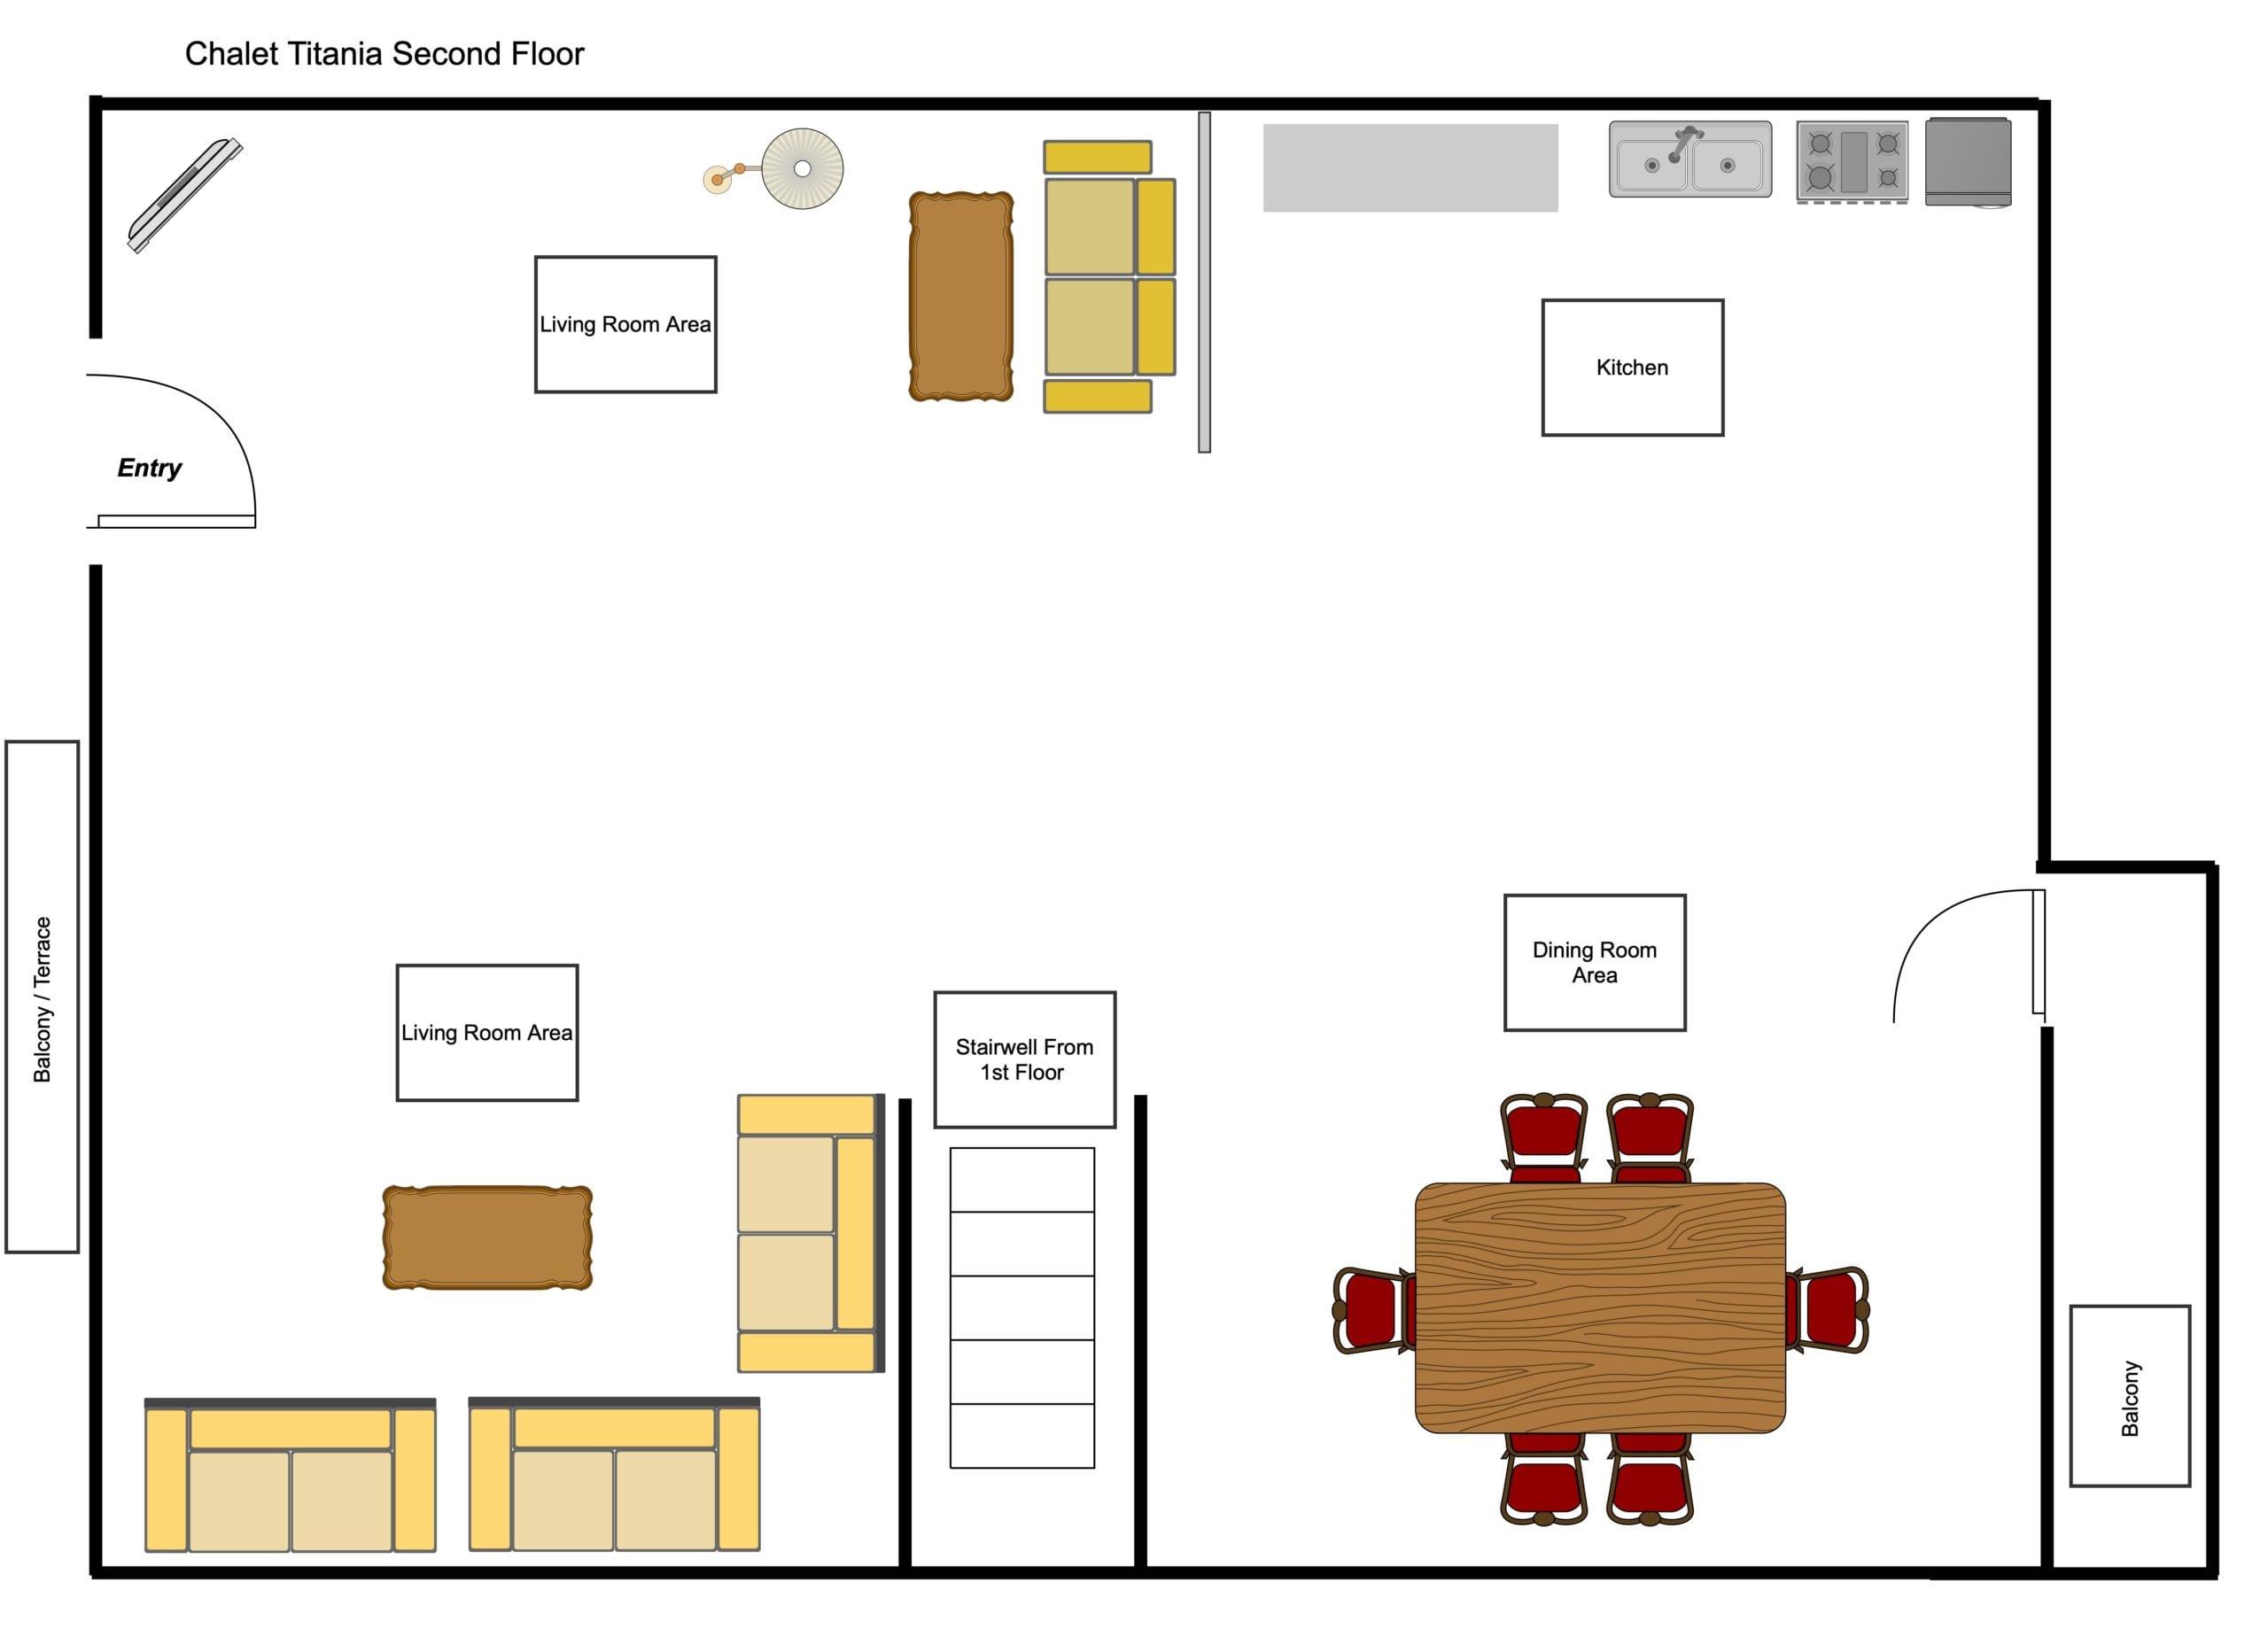 Chalet Titania - Second Floor Floorplan